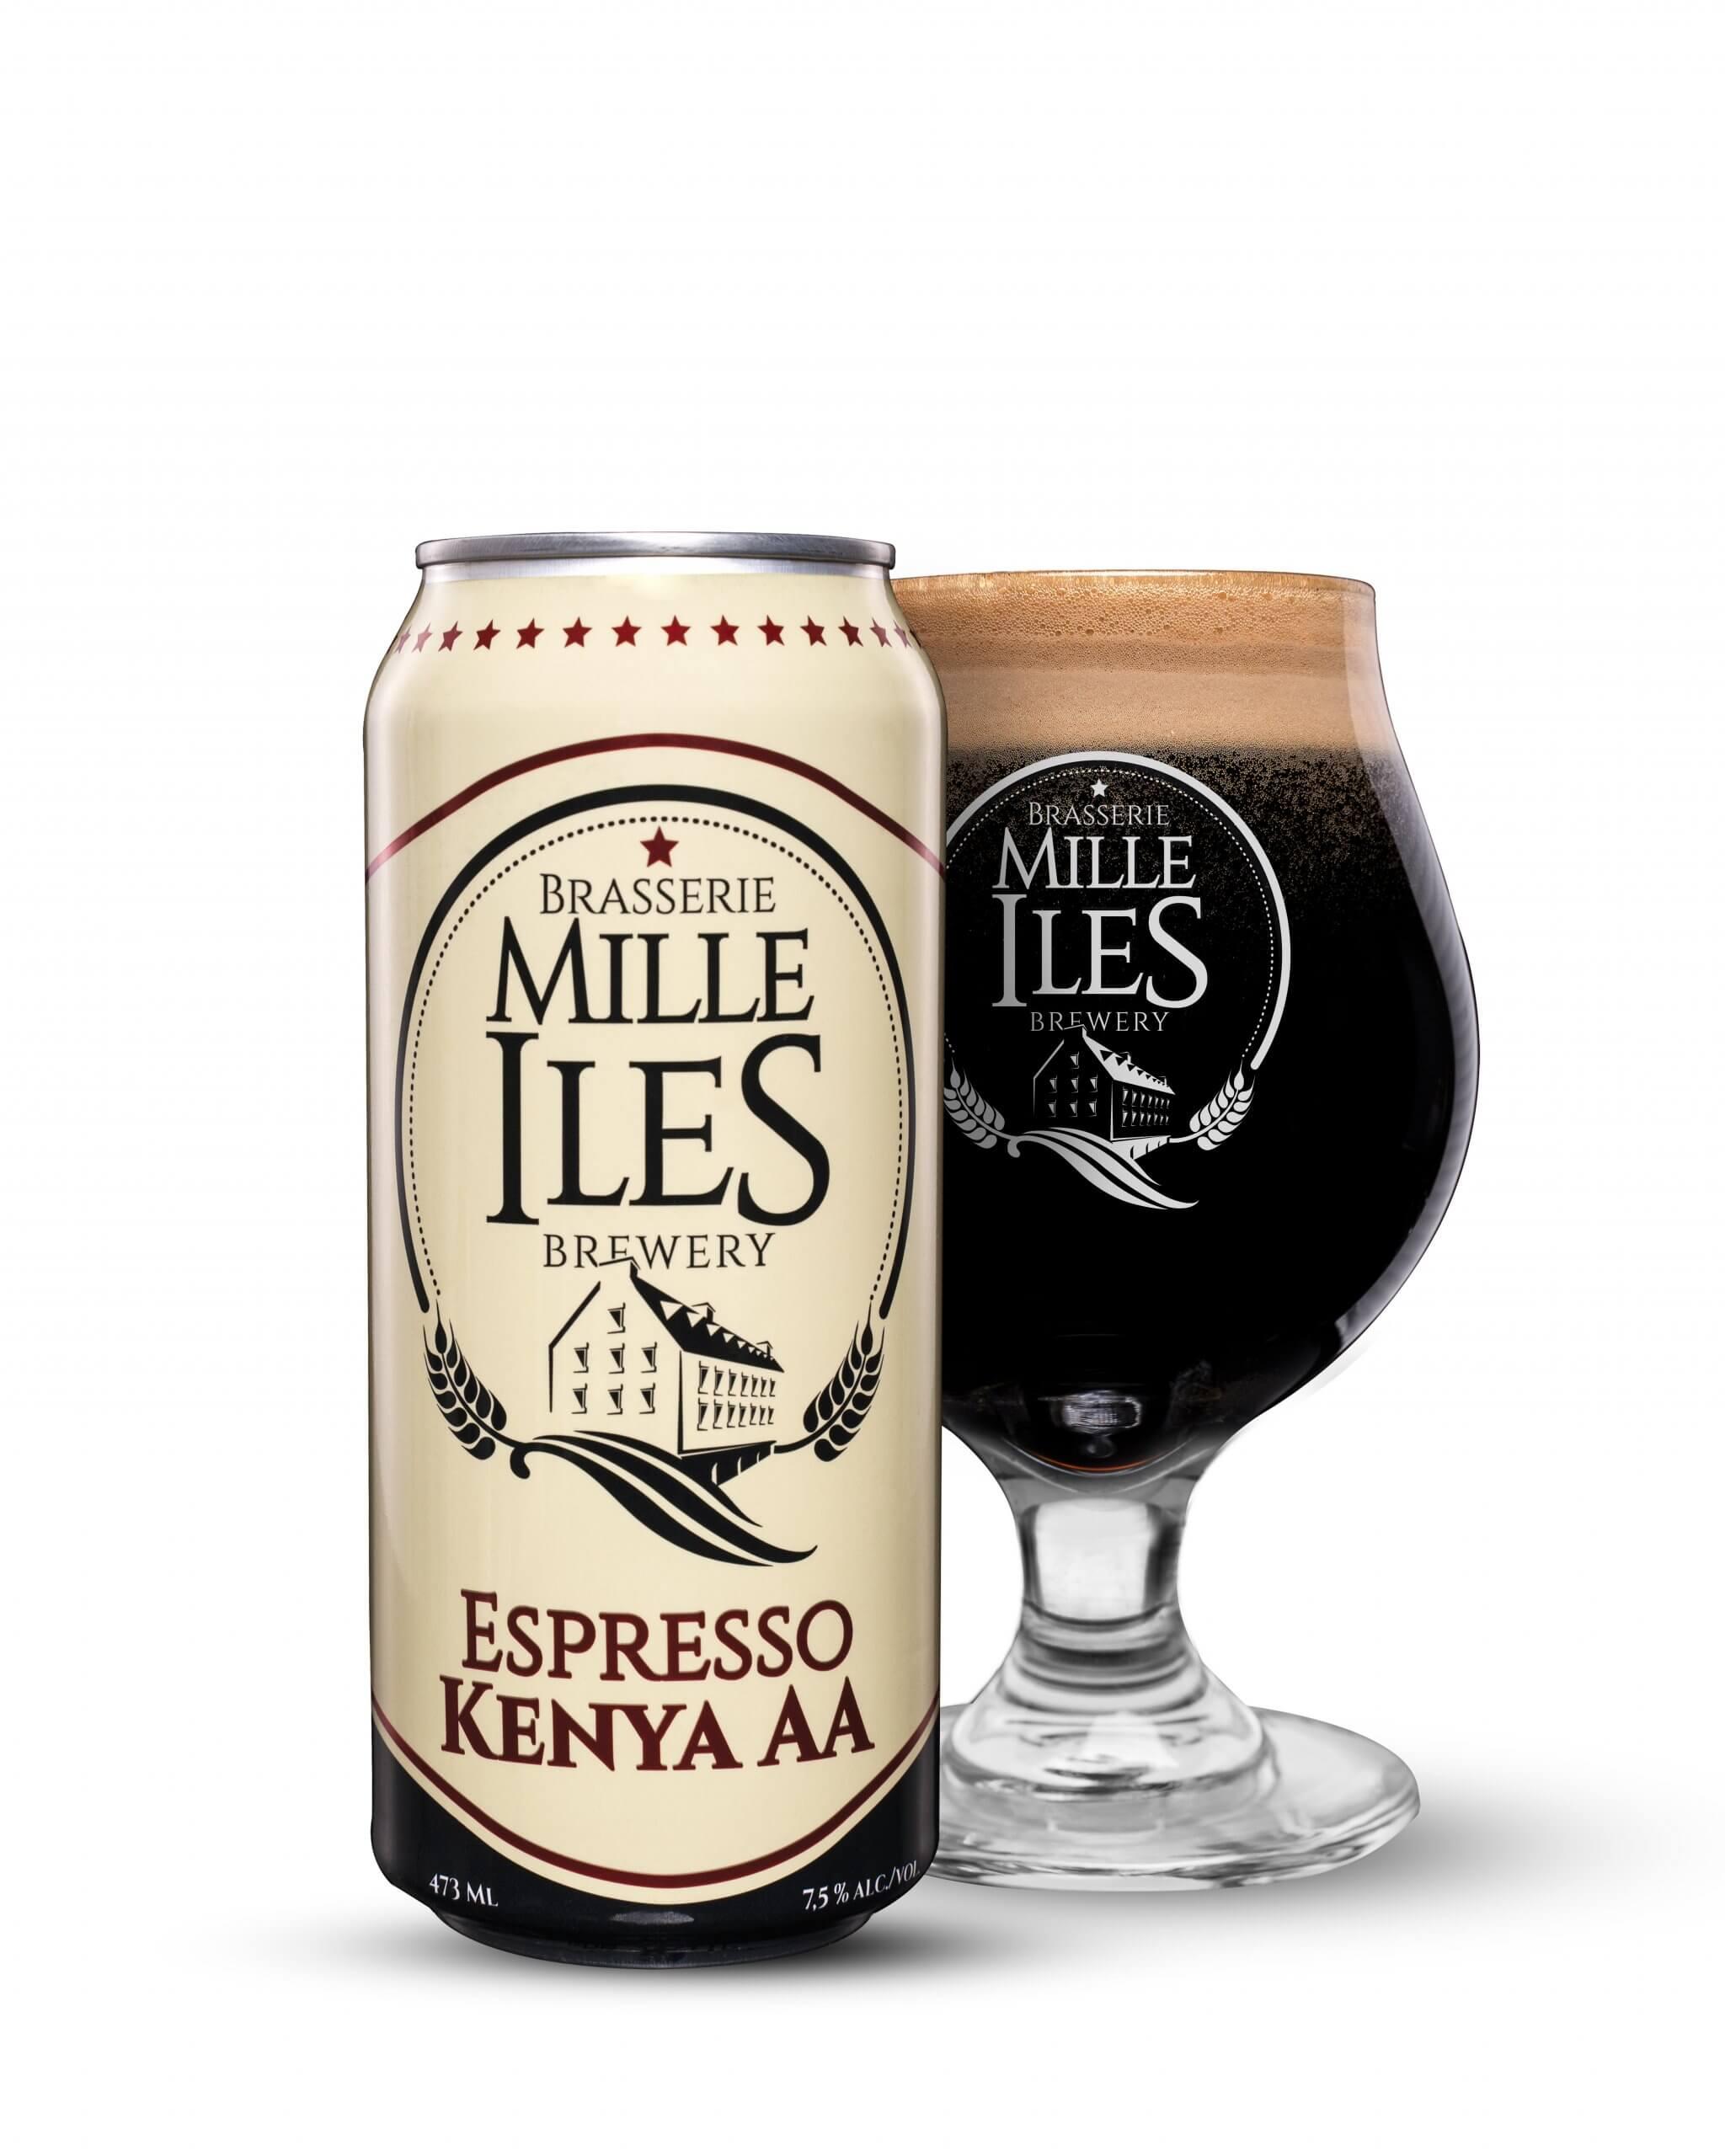 Espresso Kenya AA